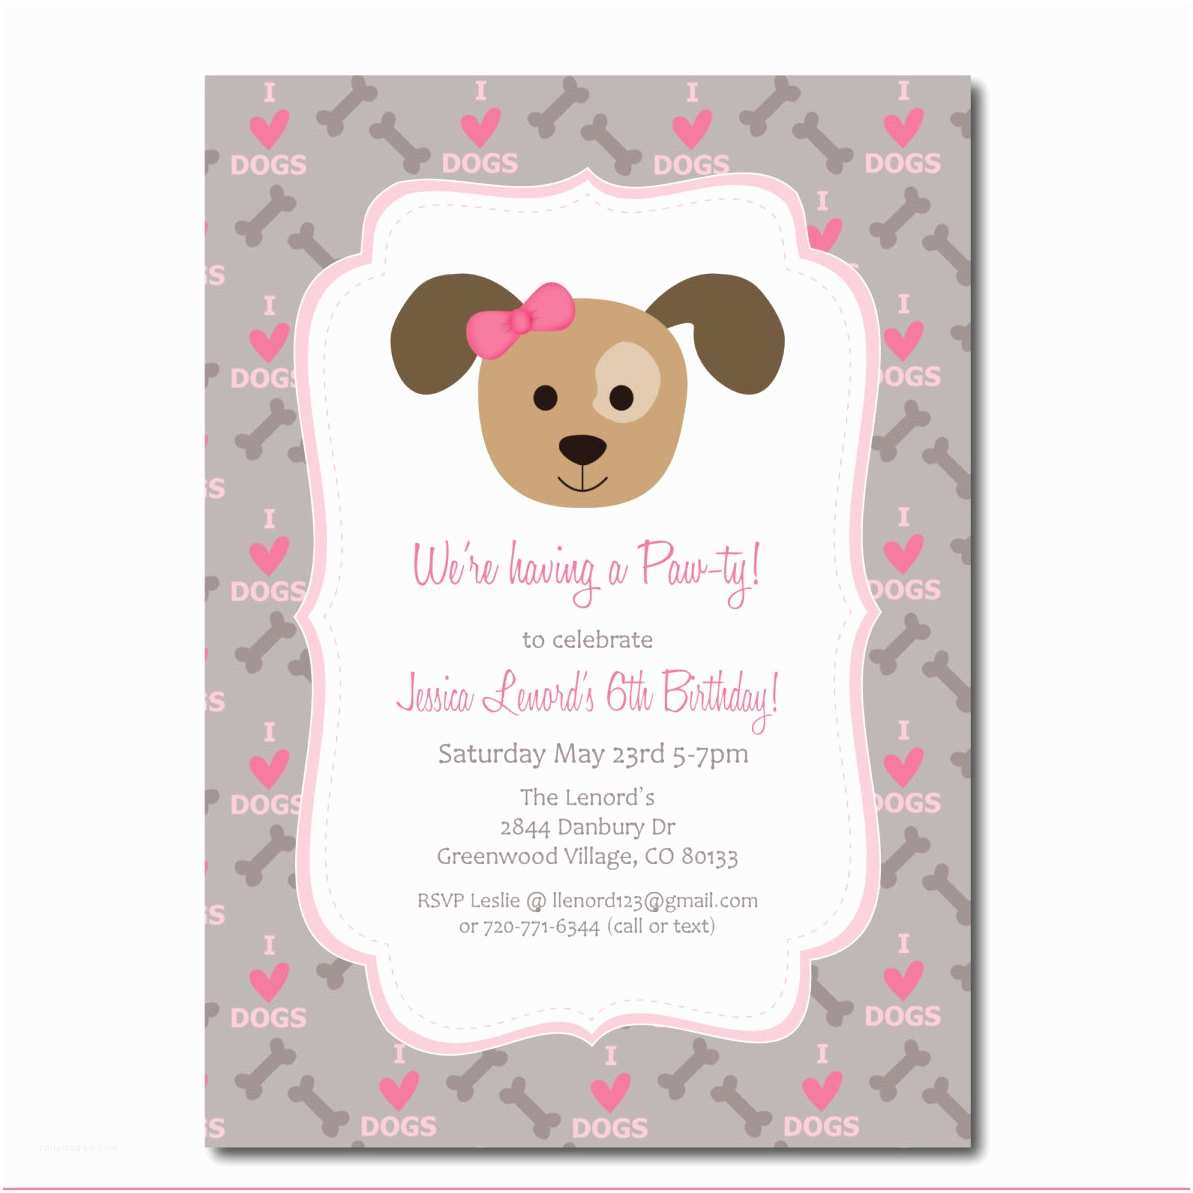 Dog Birthday Invitations Puppy Party Invitation With Editable Text